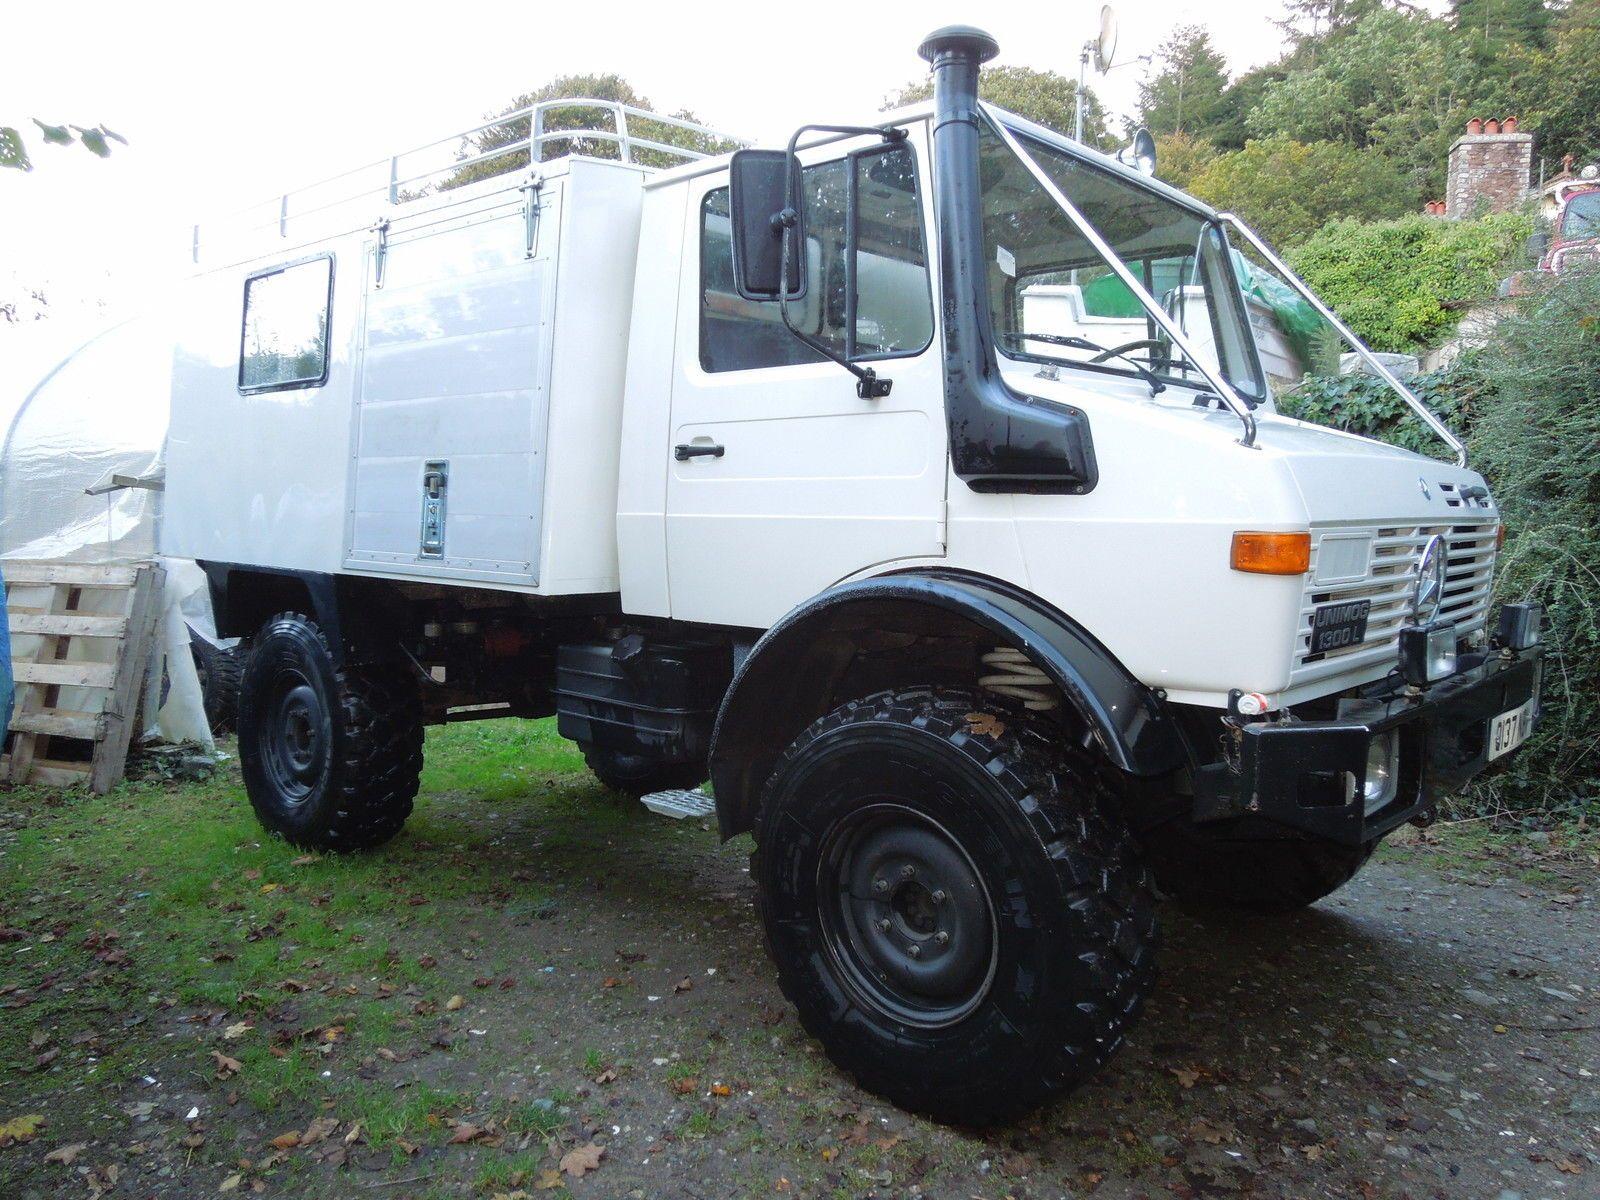 Mercedes Unimog 435 Expedition Overland Camper Paris Dakar